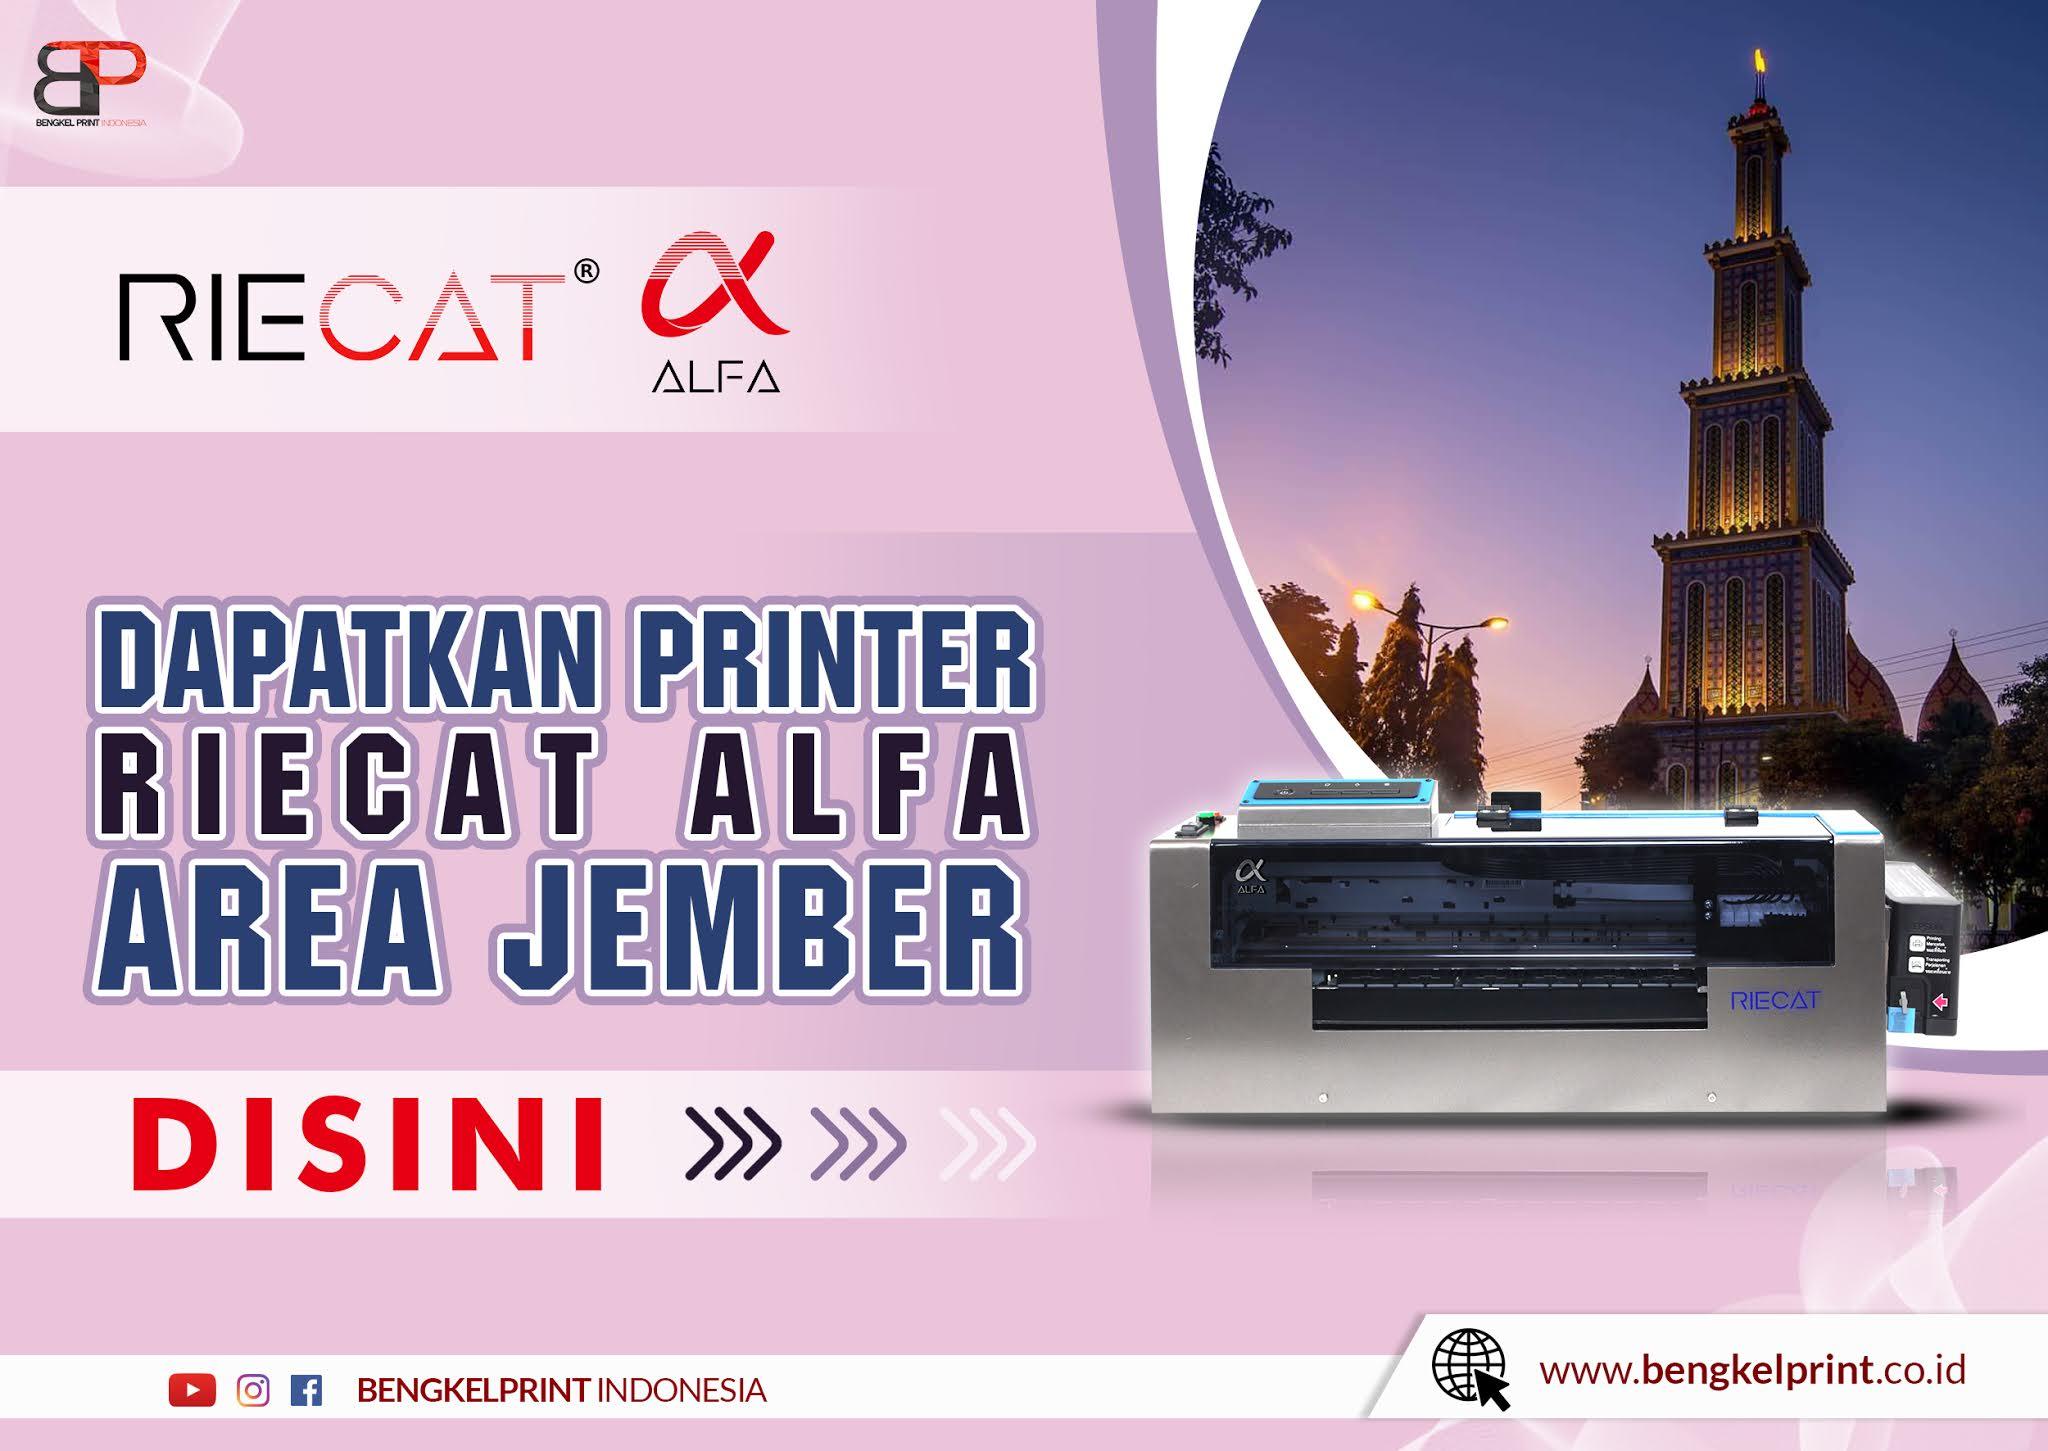 Paket Printer RIECAT ALFA Jember